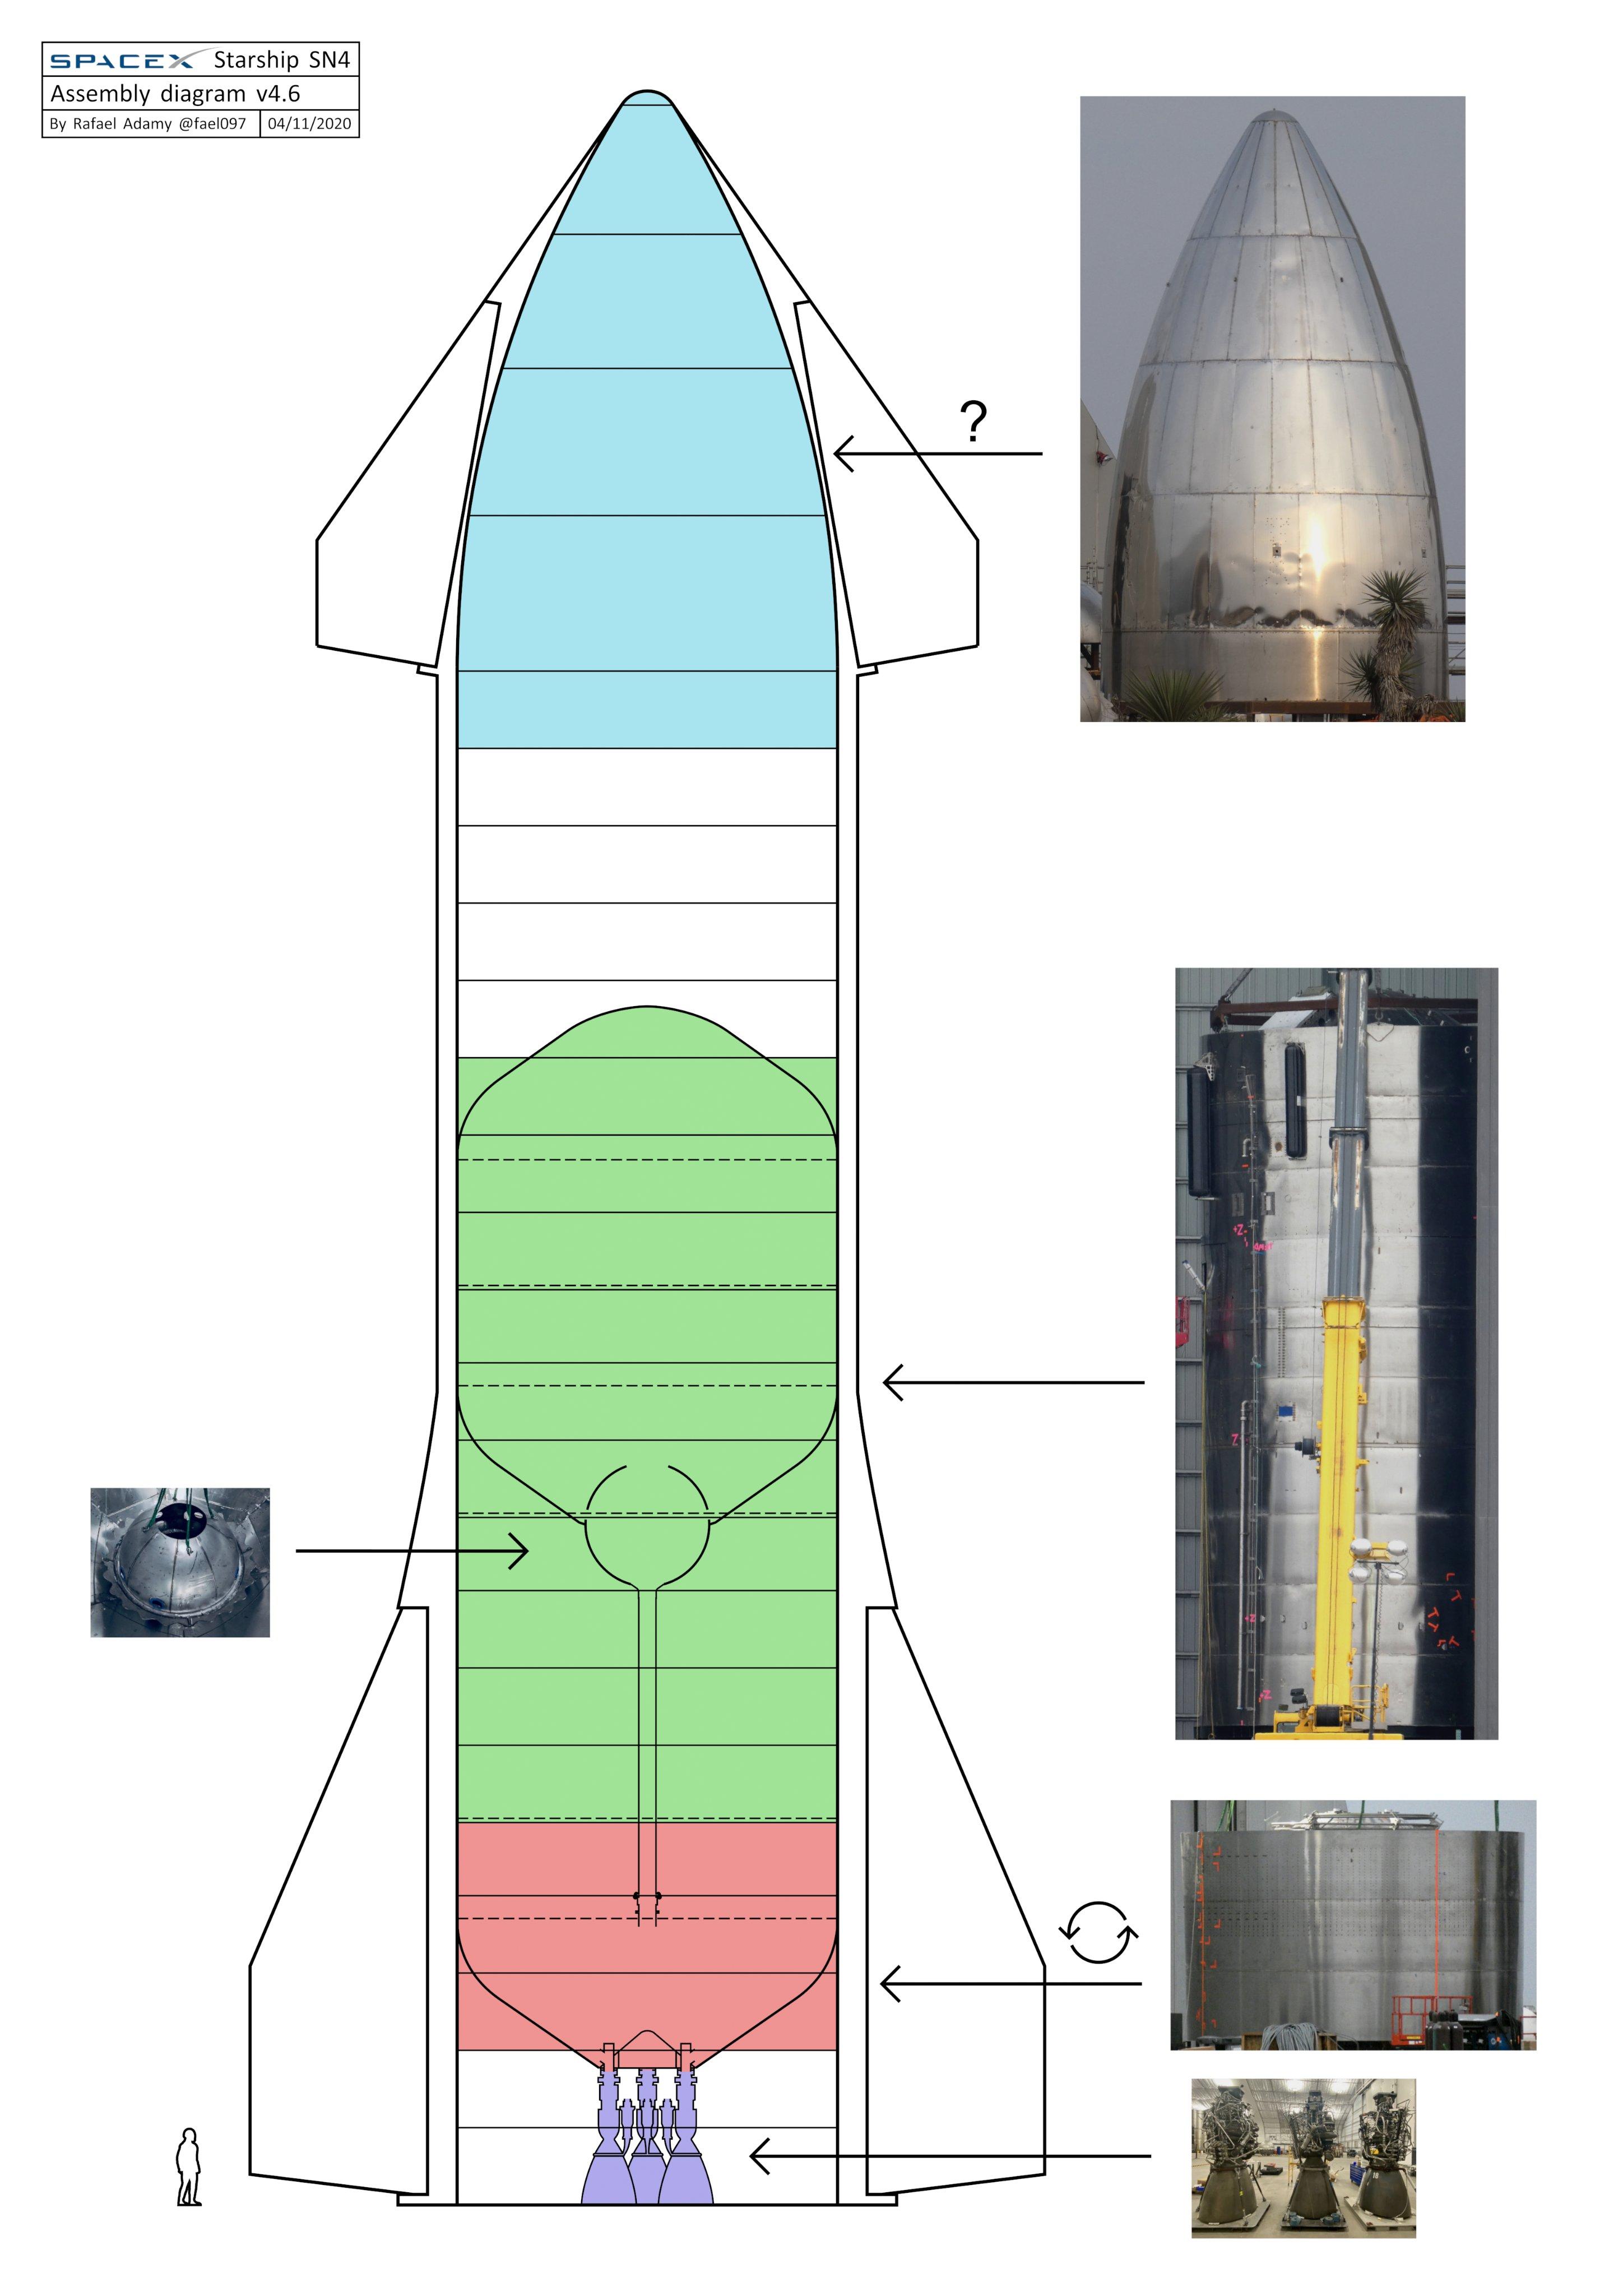 Starship SN4 (Boca Chica) - Page 4 EVWgqqRXkAU-wq0?format=jpg&name=4096x4096